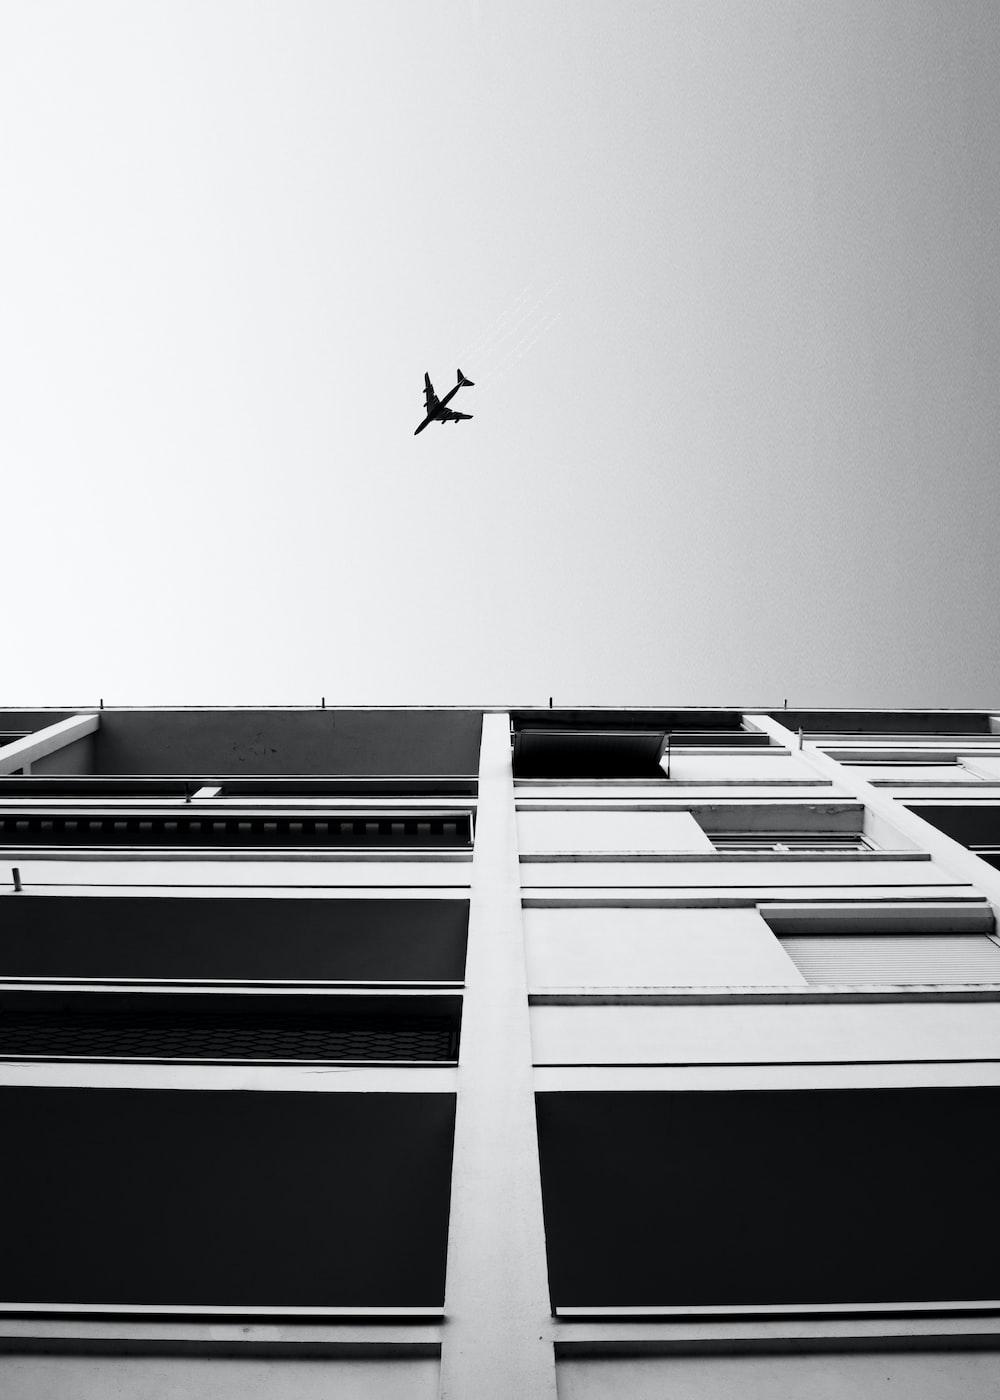 flying airplane during daytime